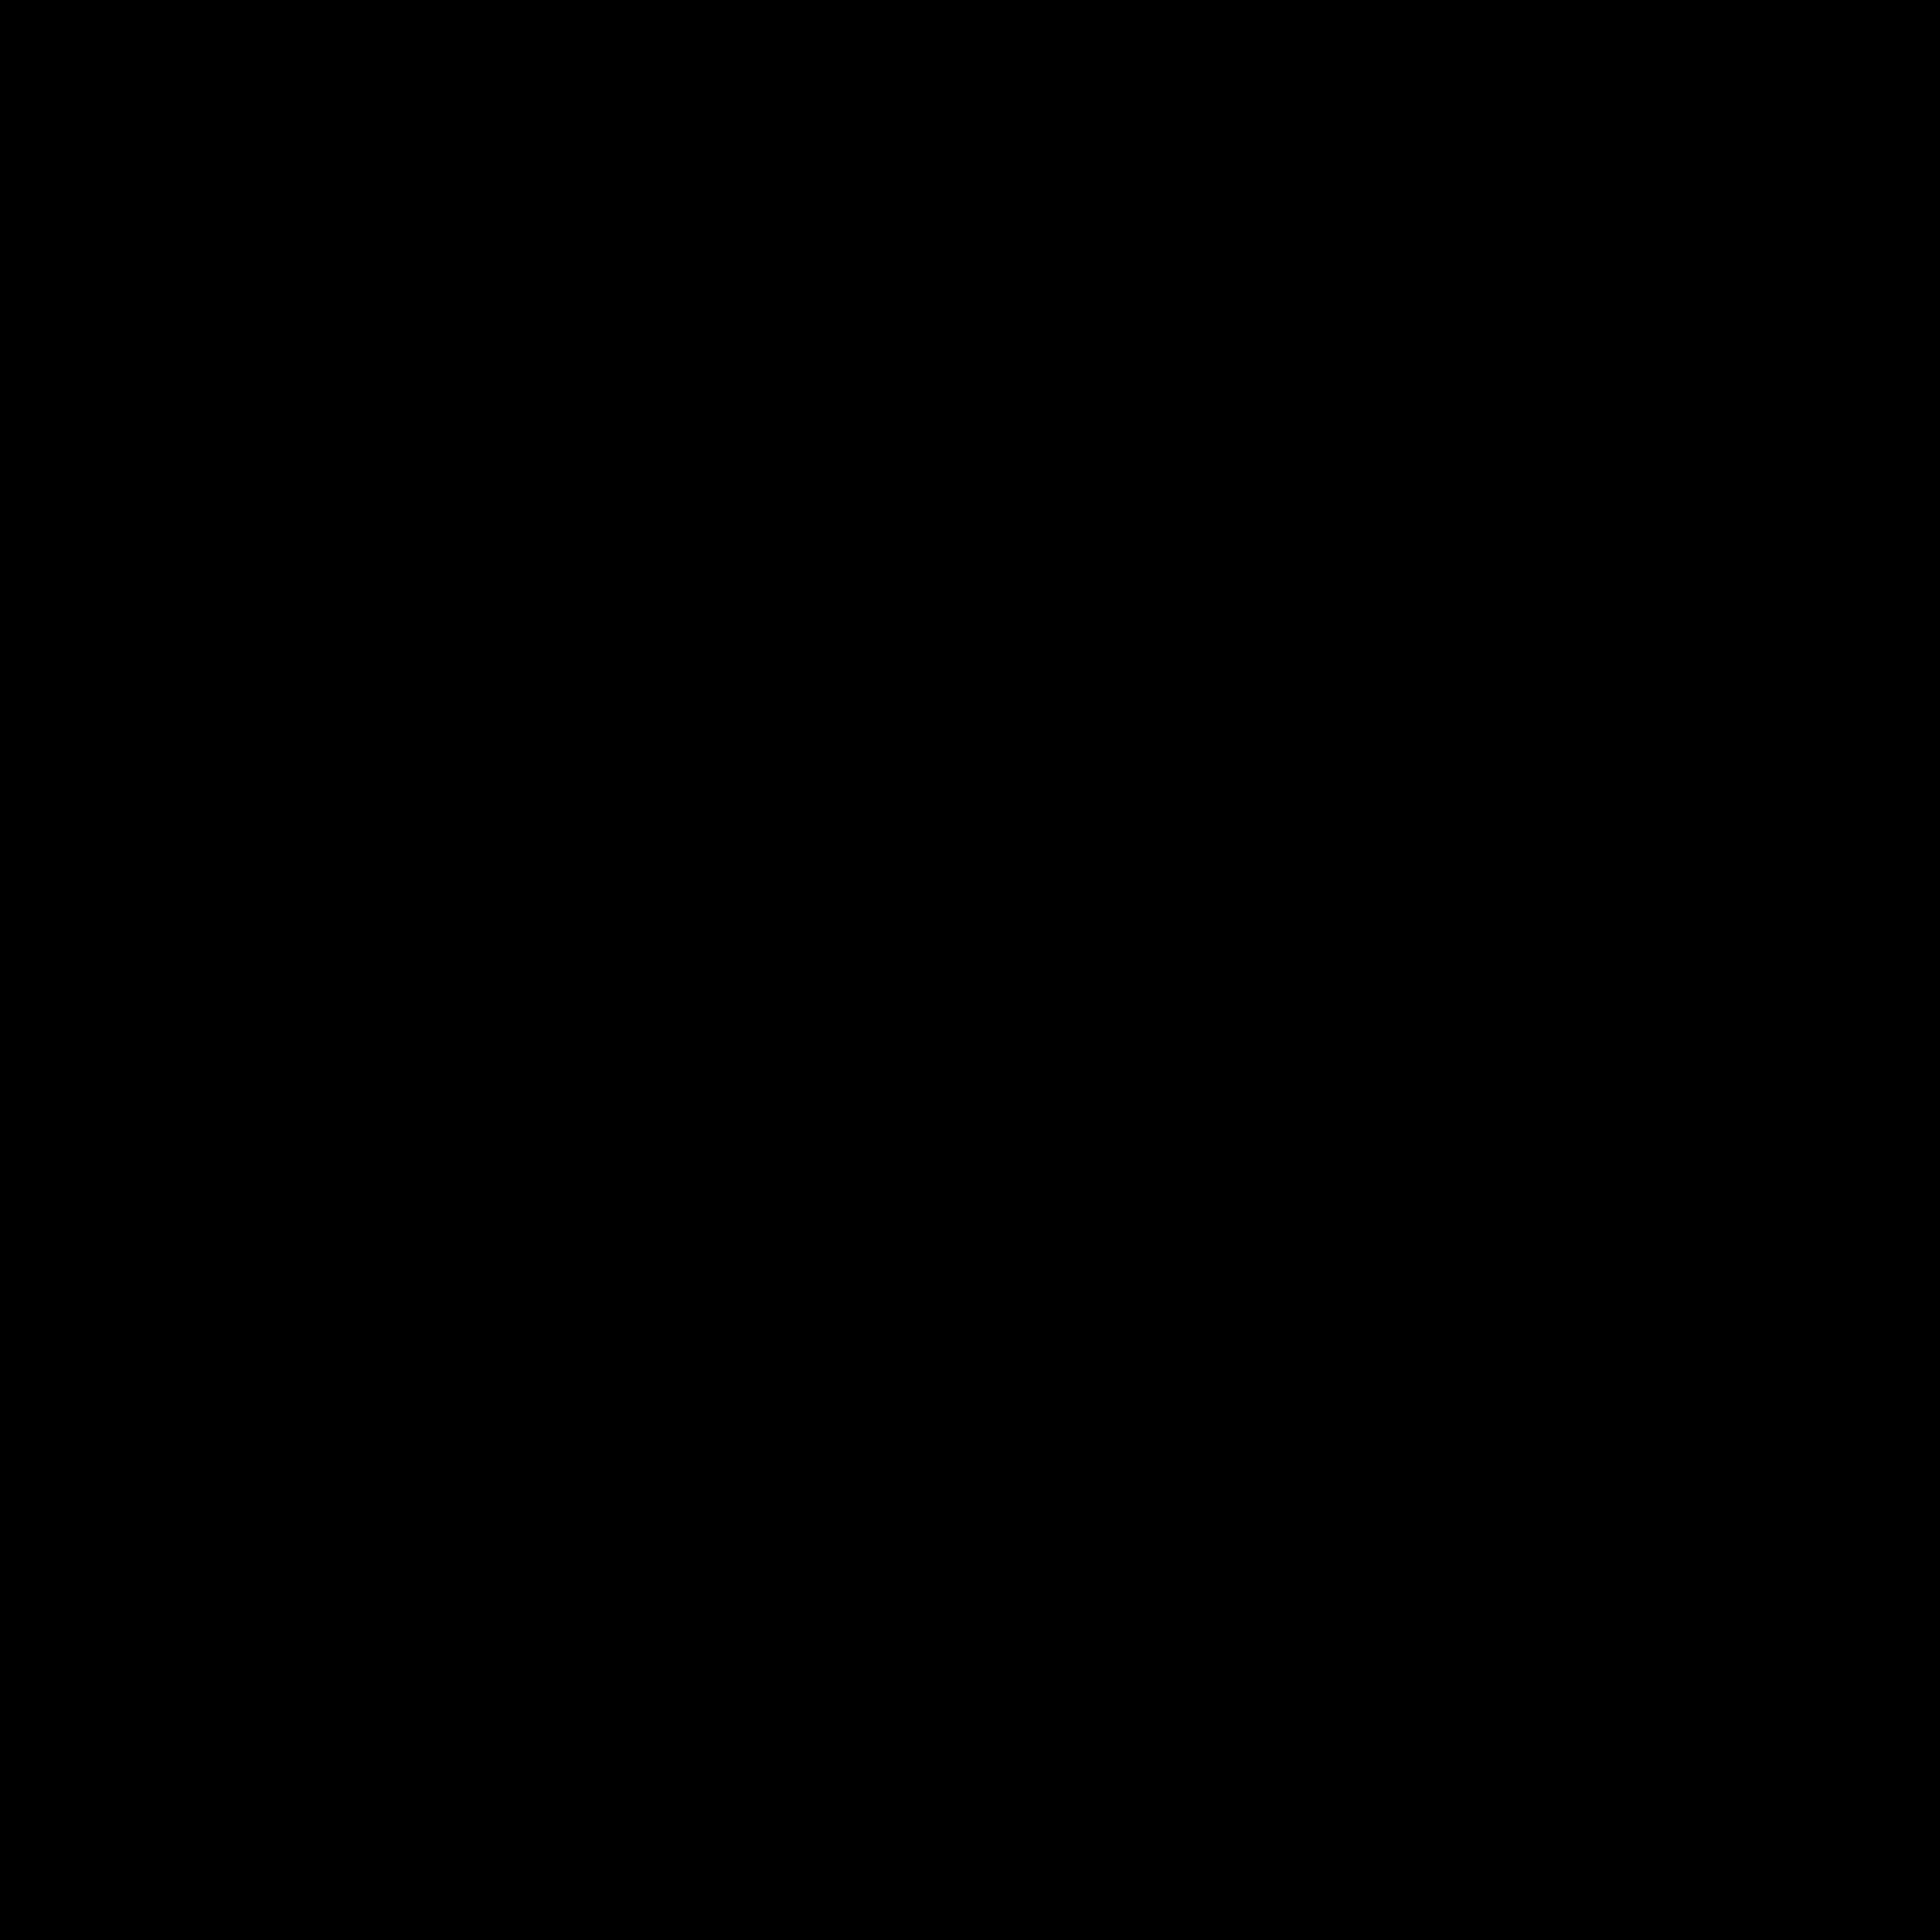 Brentionboard